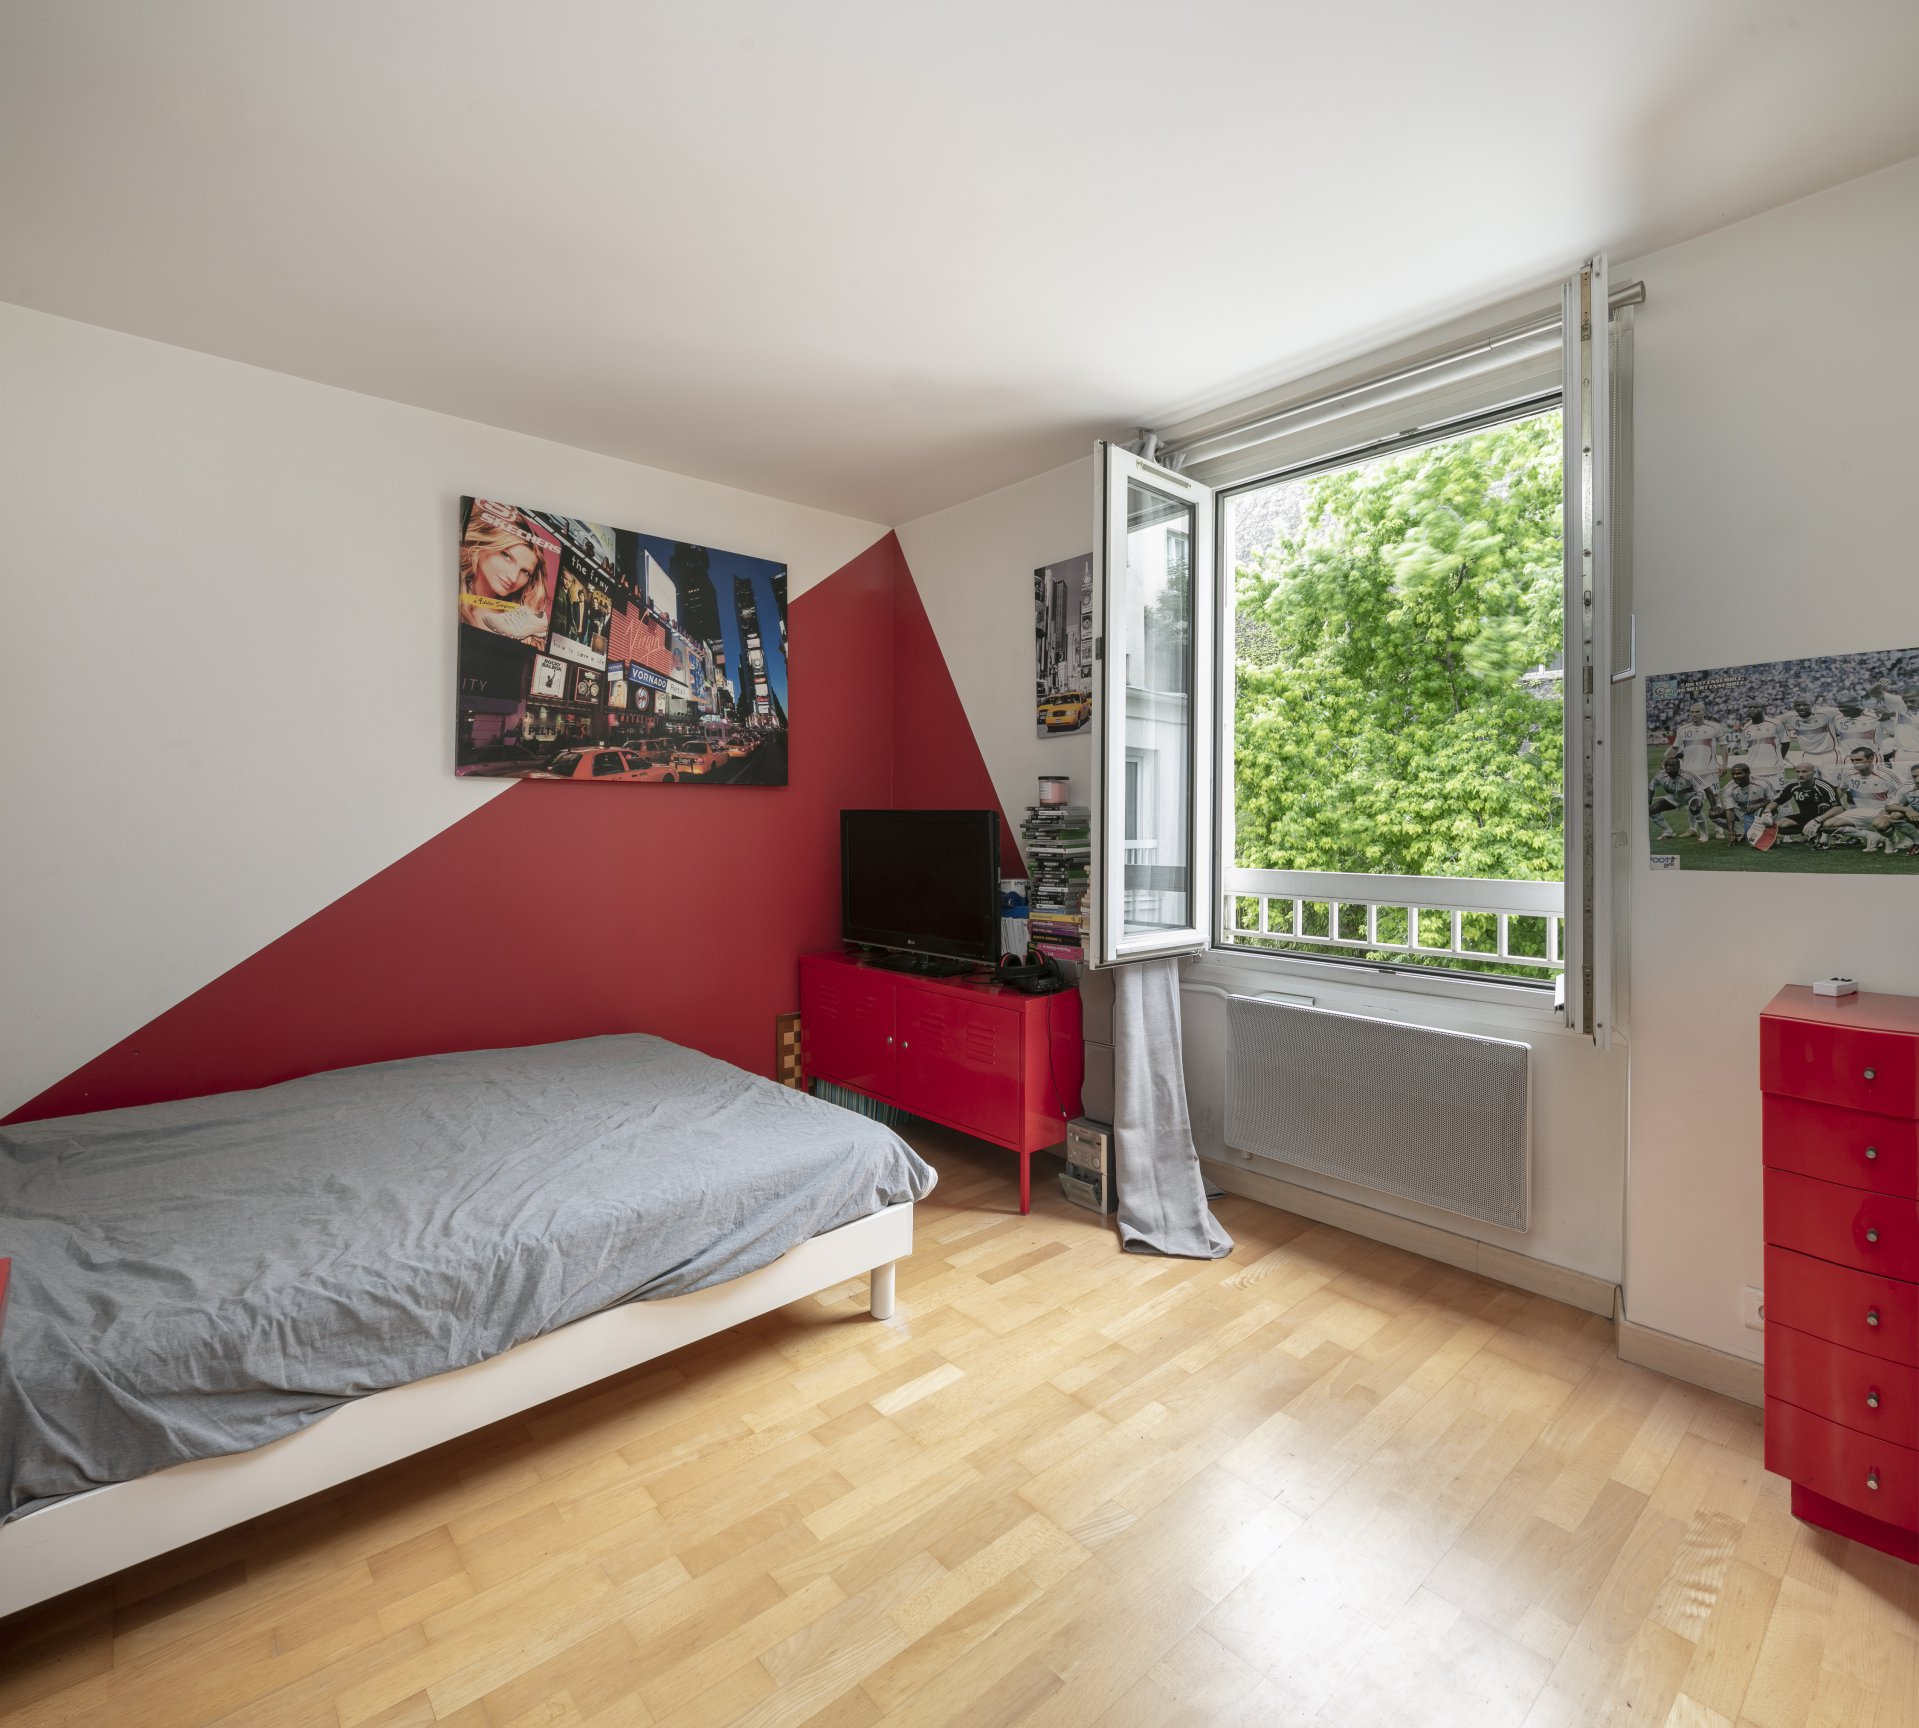 hotel-particulier-a-vendre-avenue-saint-mande-terrasse-local-commercial-verriere